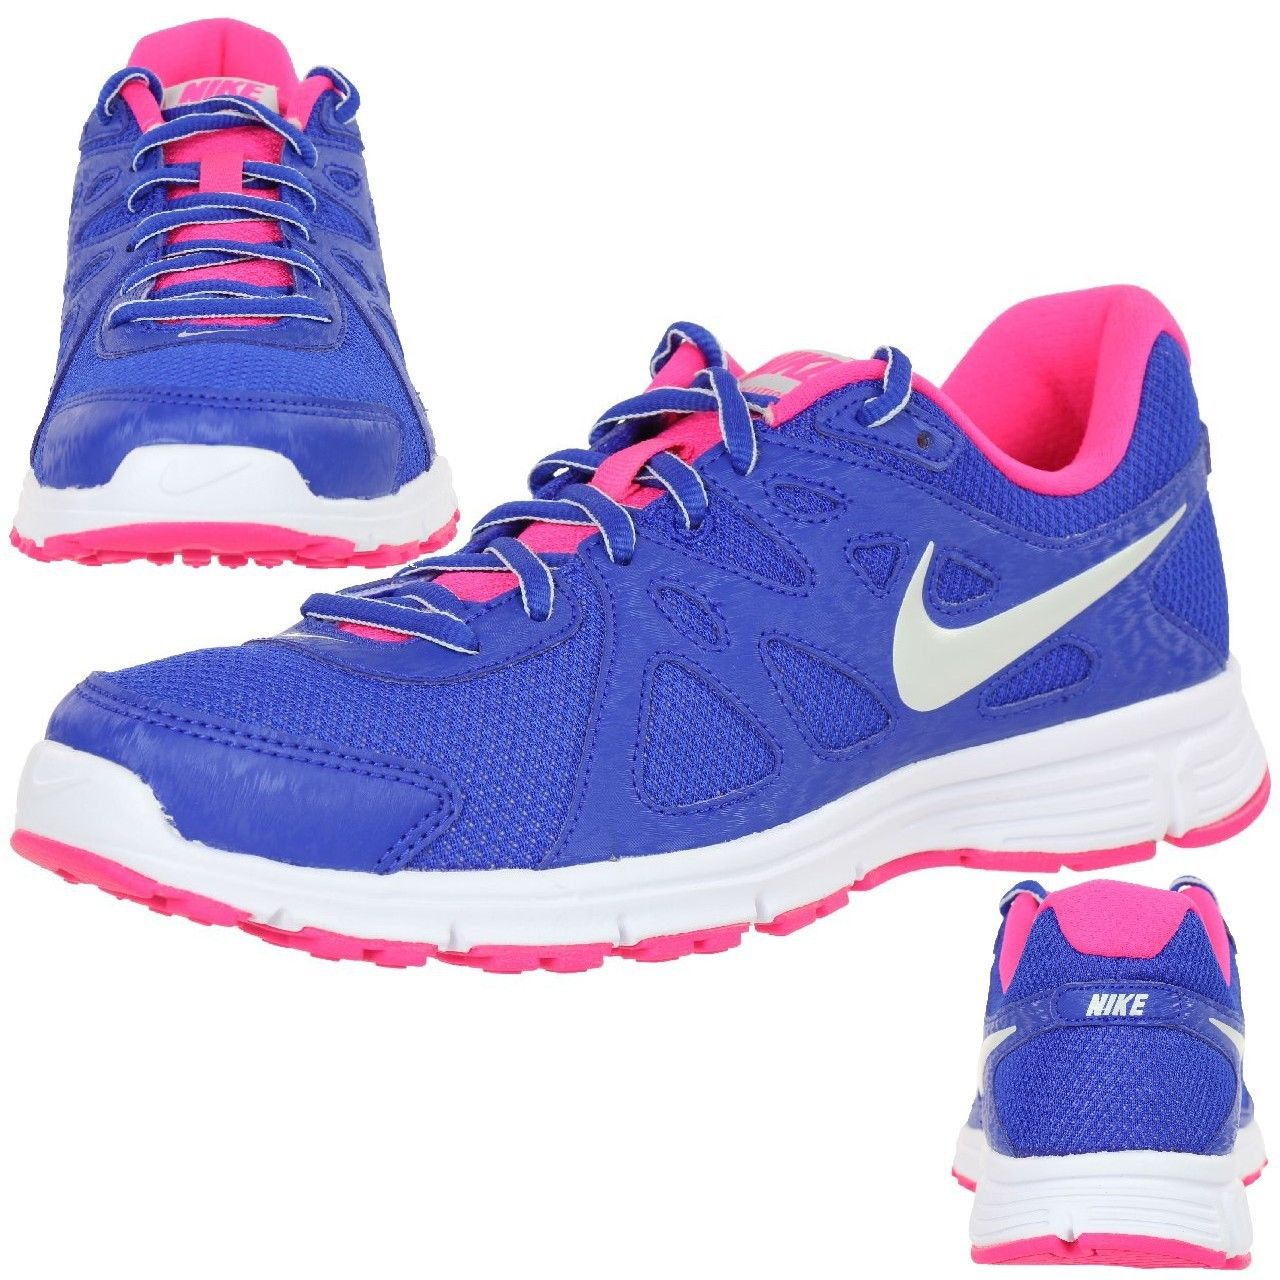 chaussure femme nike revolution 2